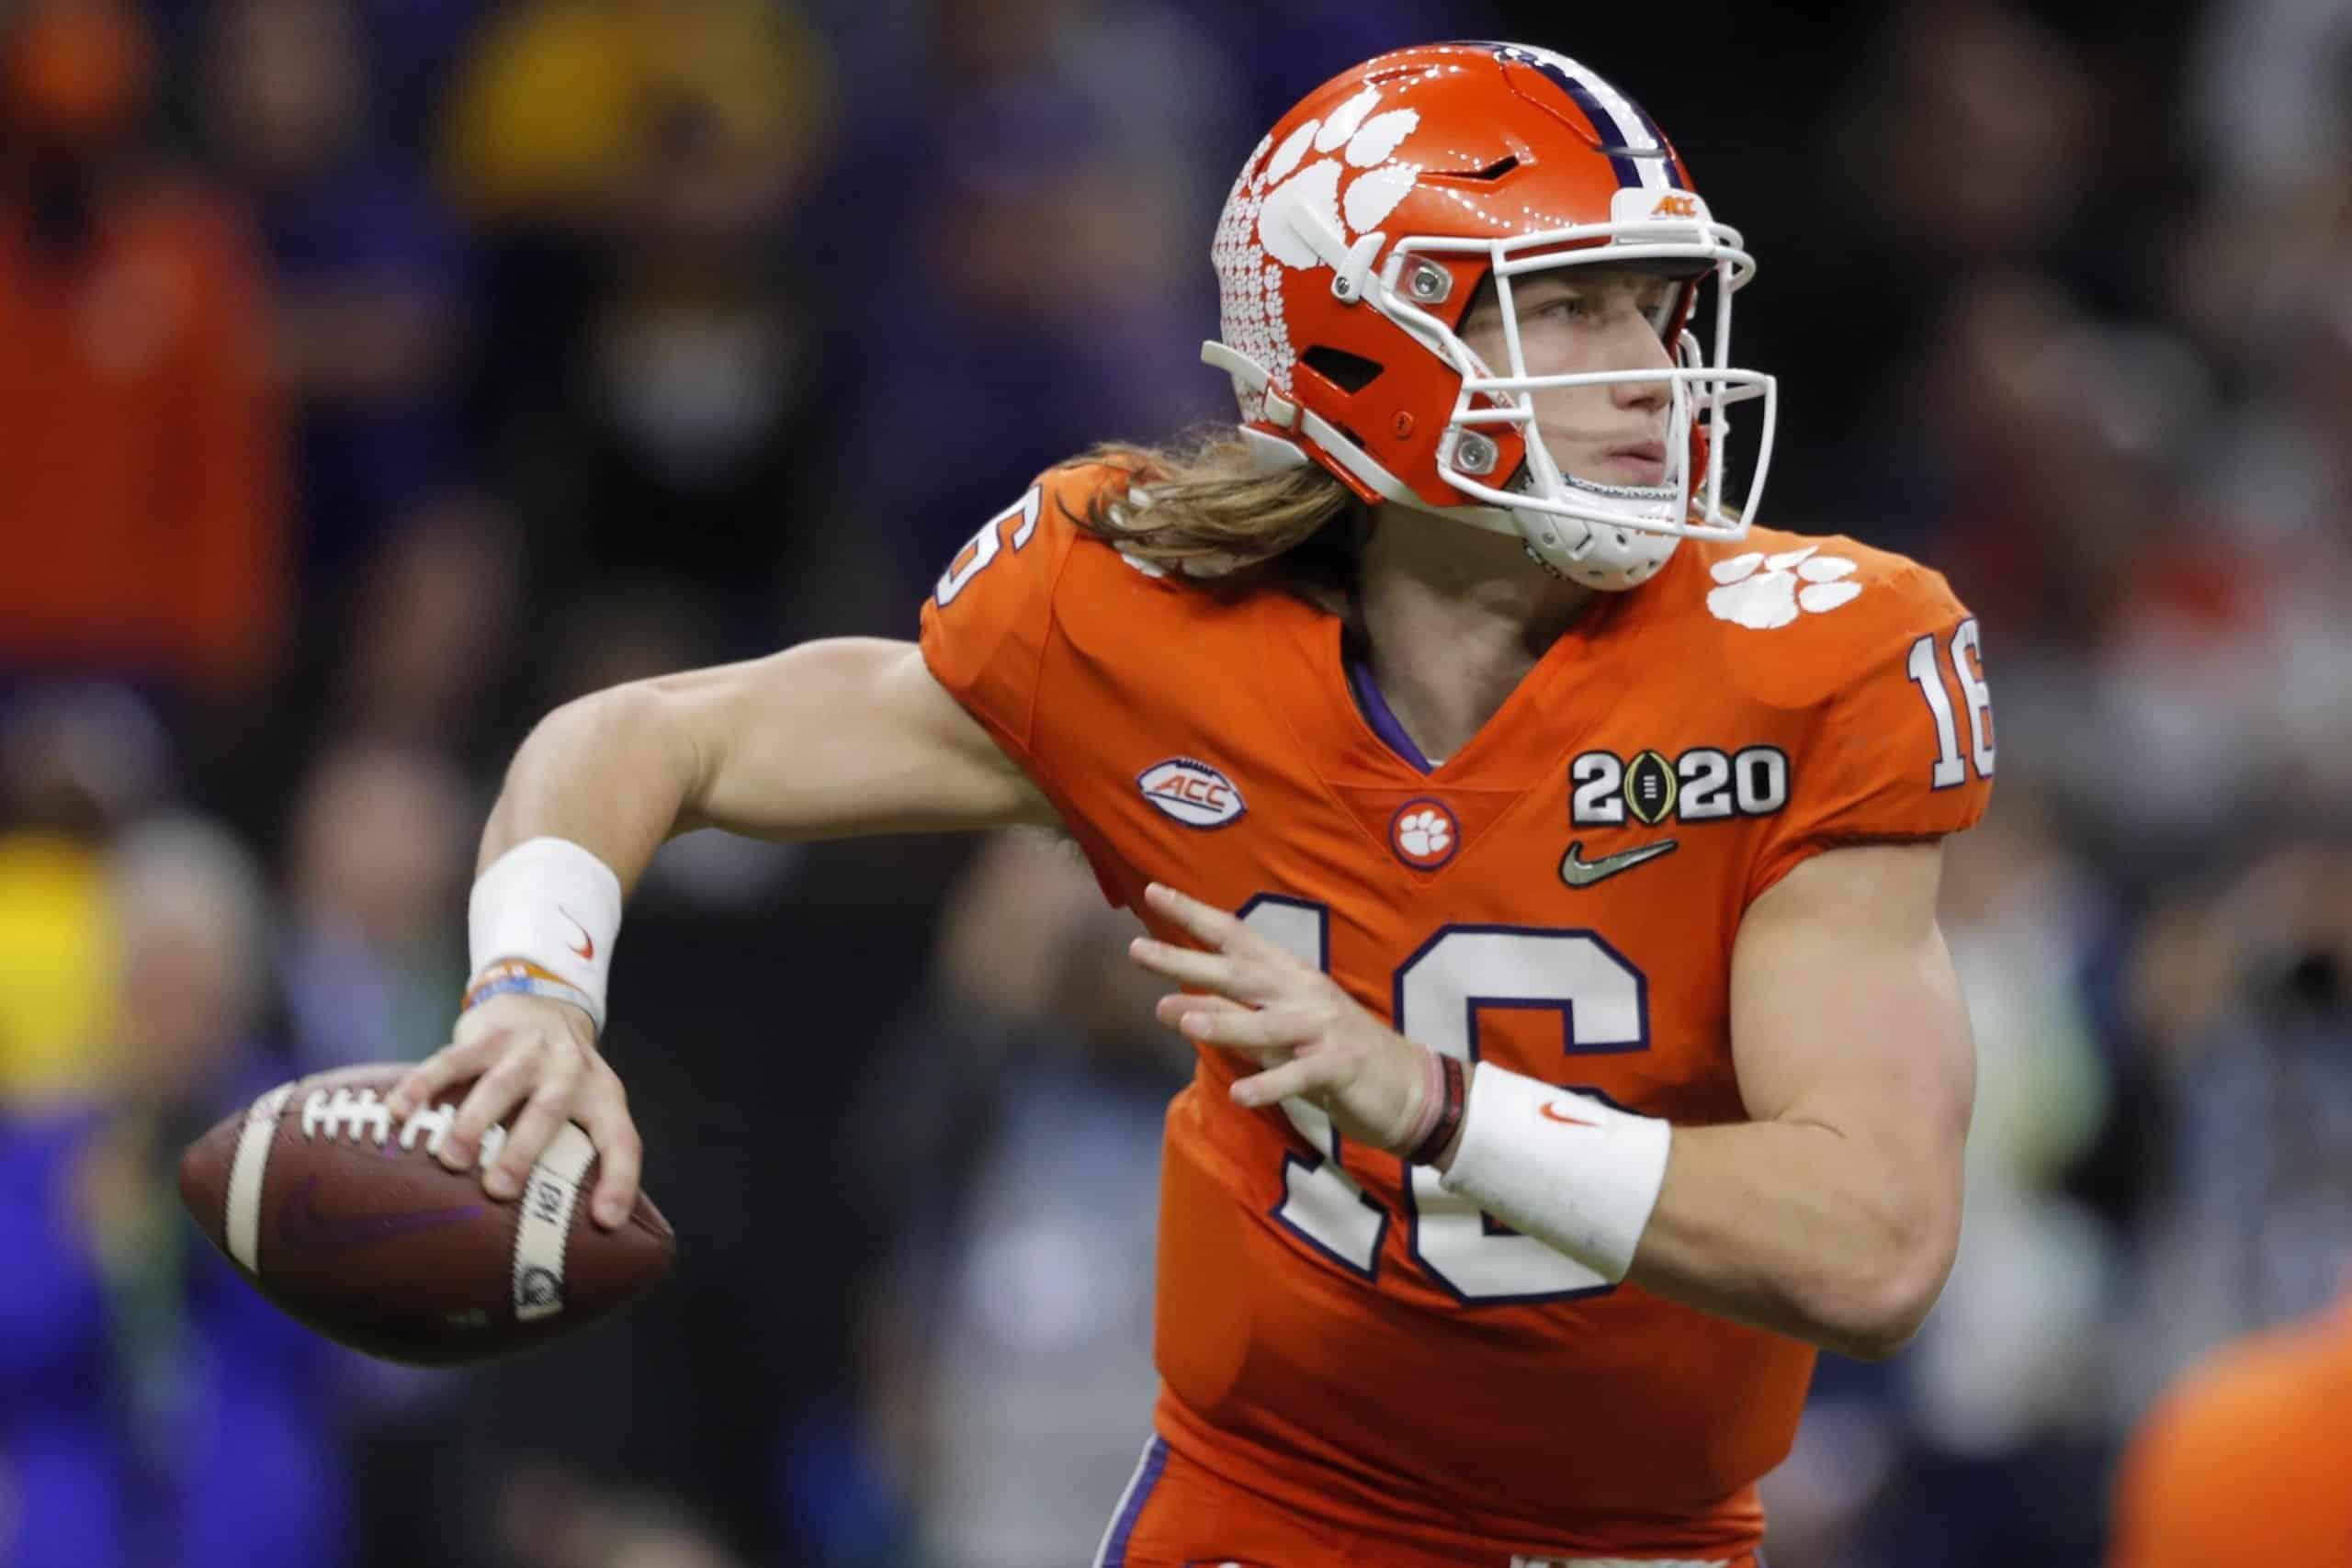 Driscoll's 7-round 2021 NFL Mock Draft